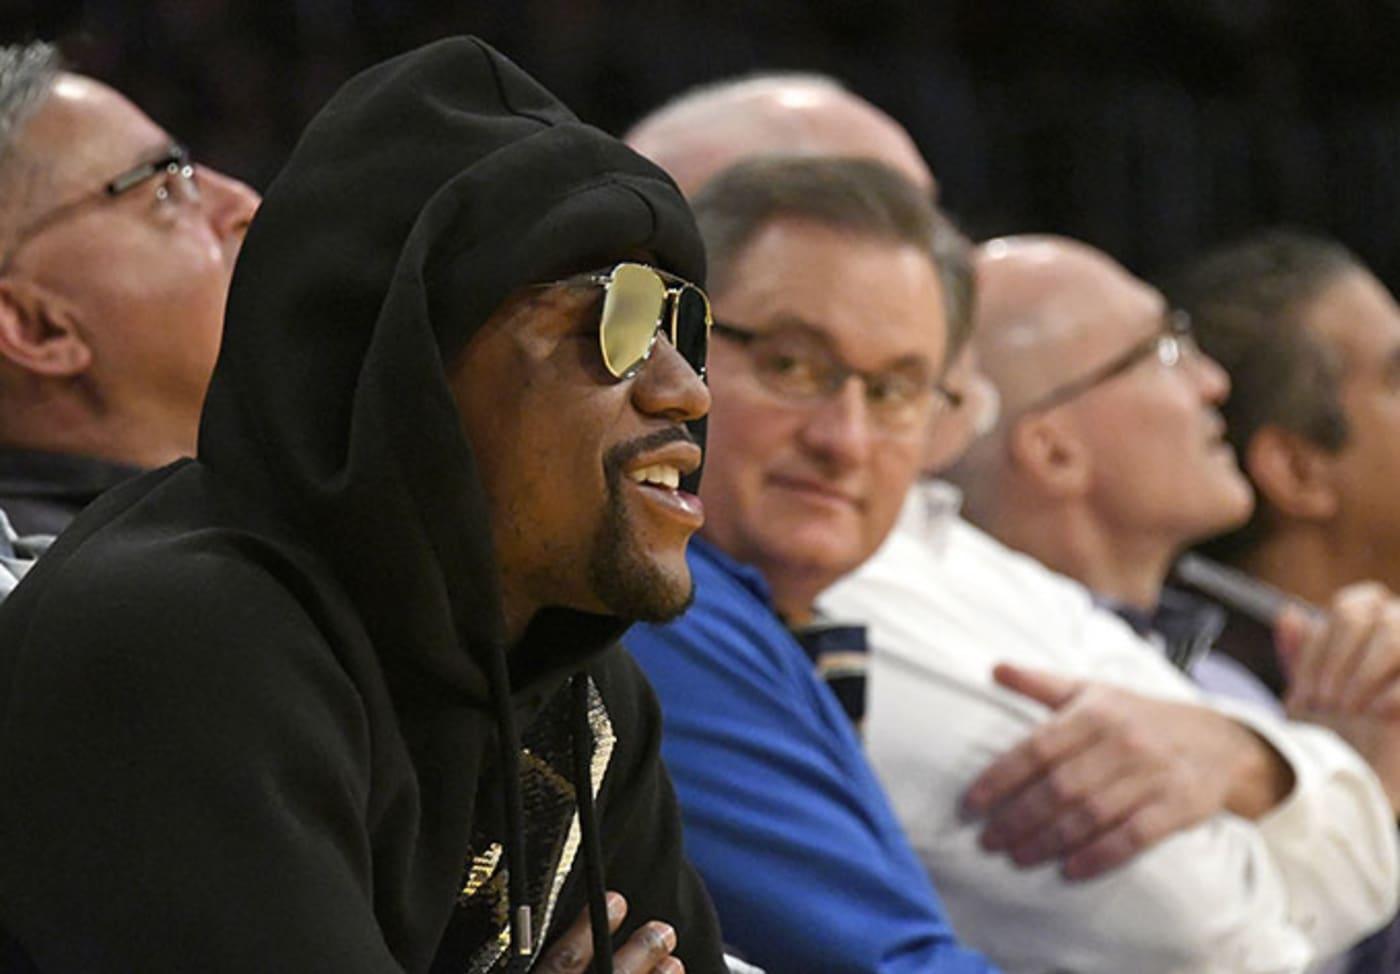 floyd mayweather wearing sunglasses